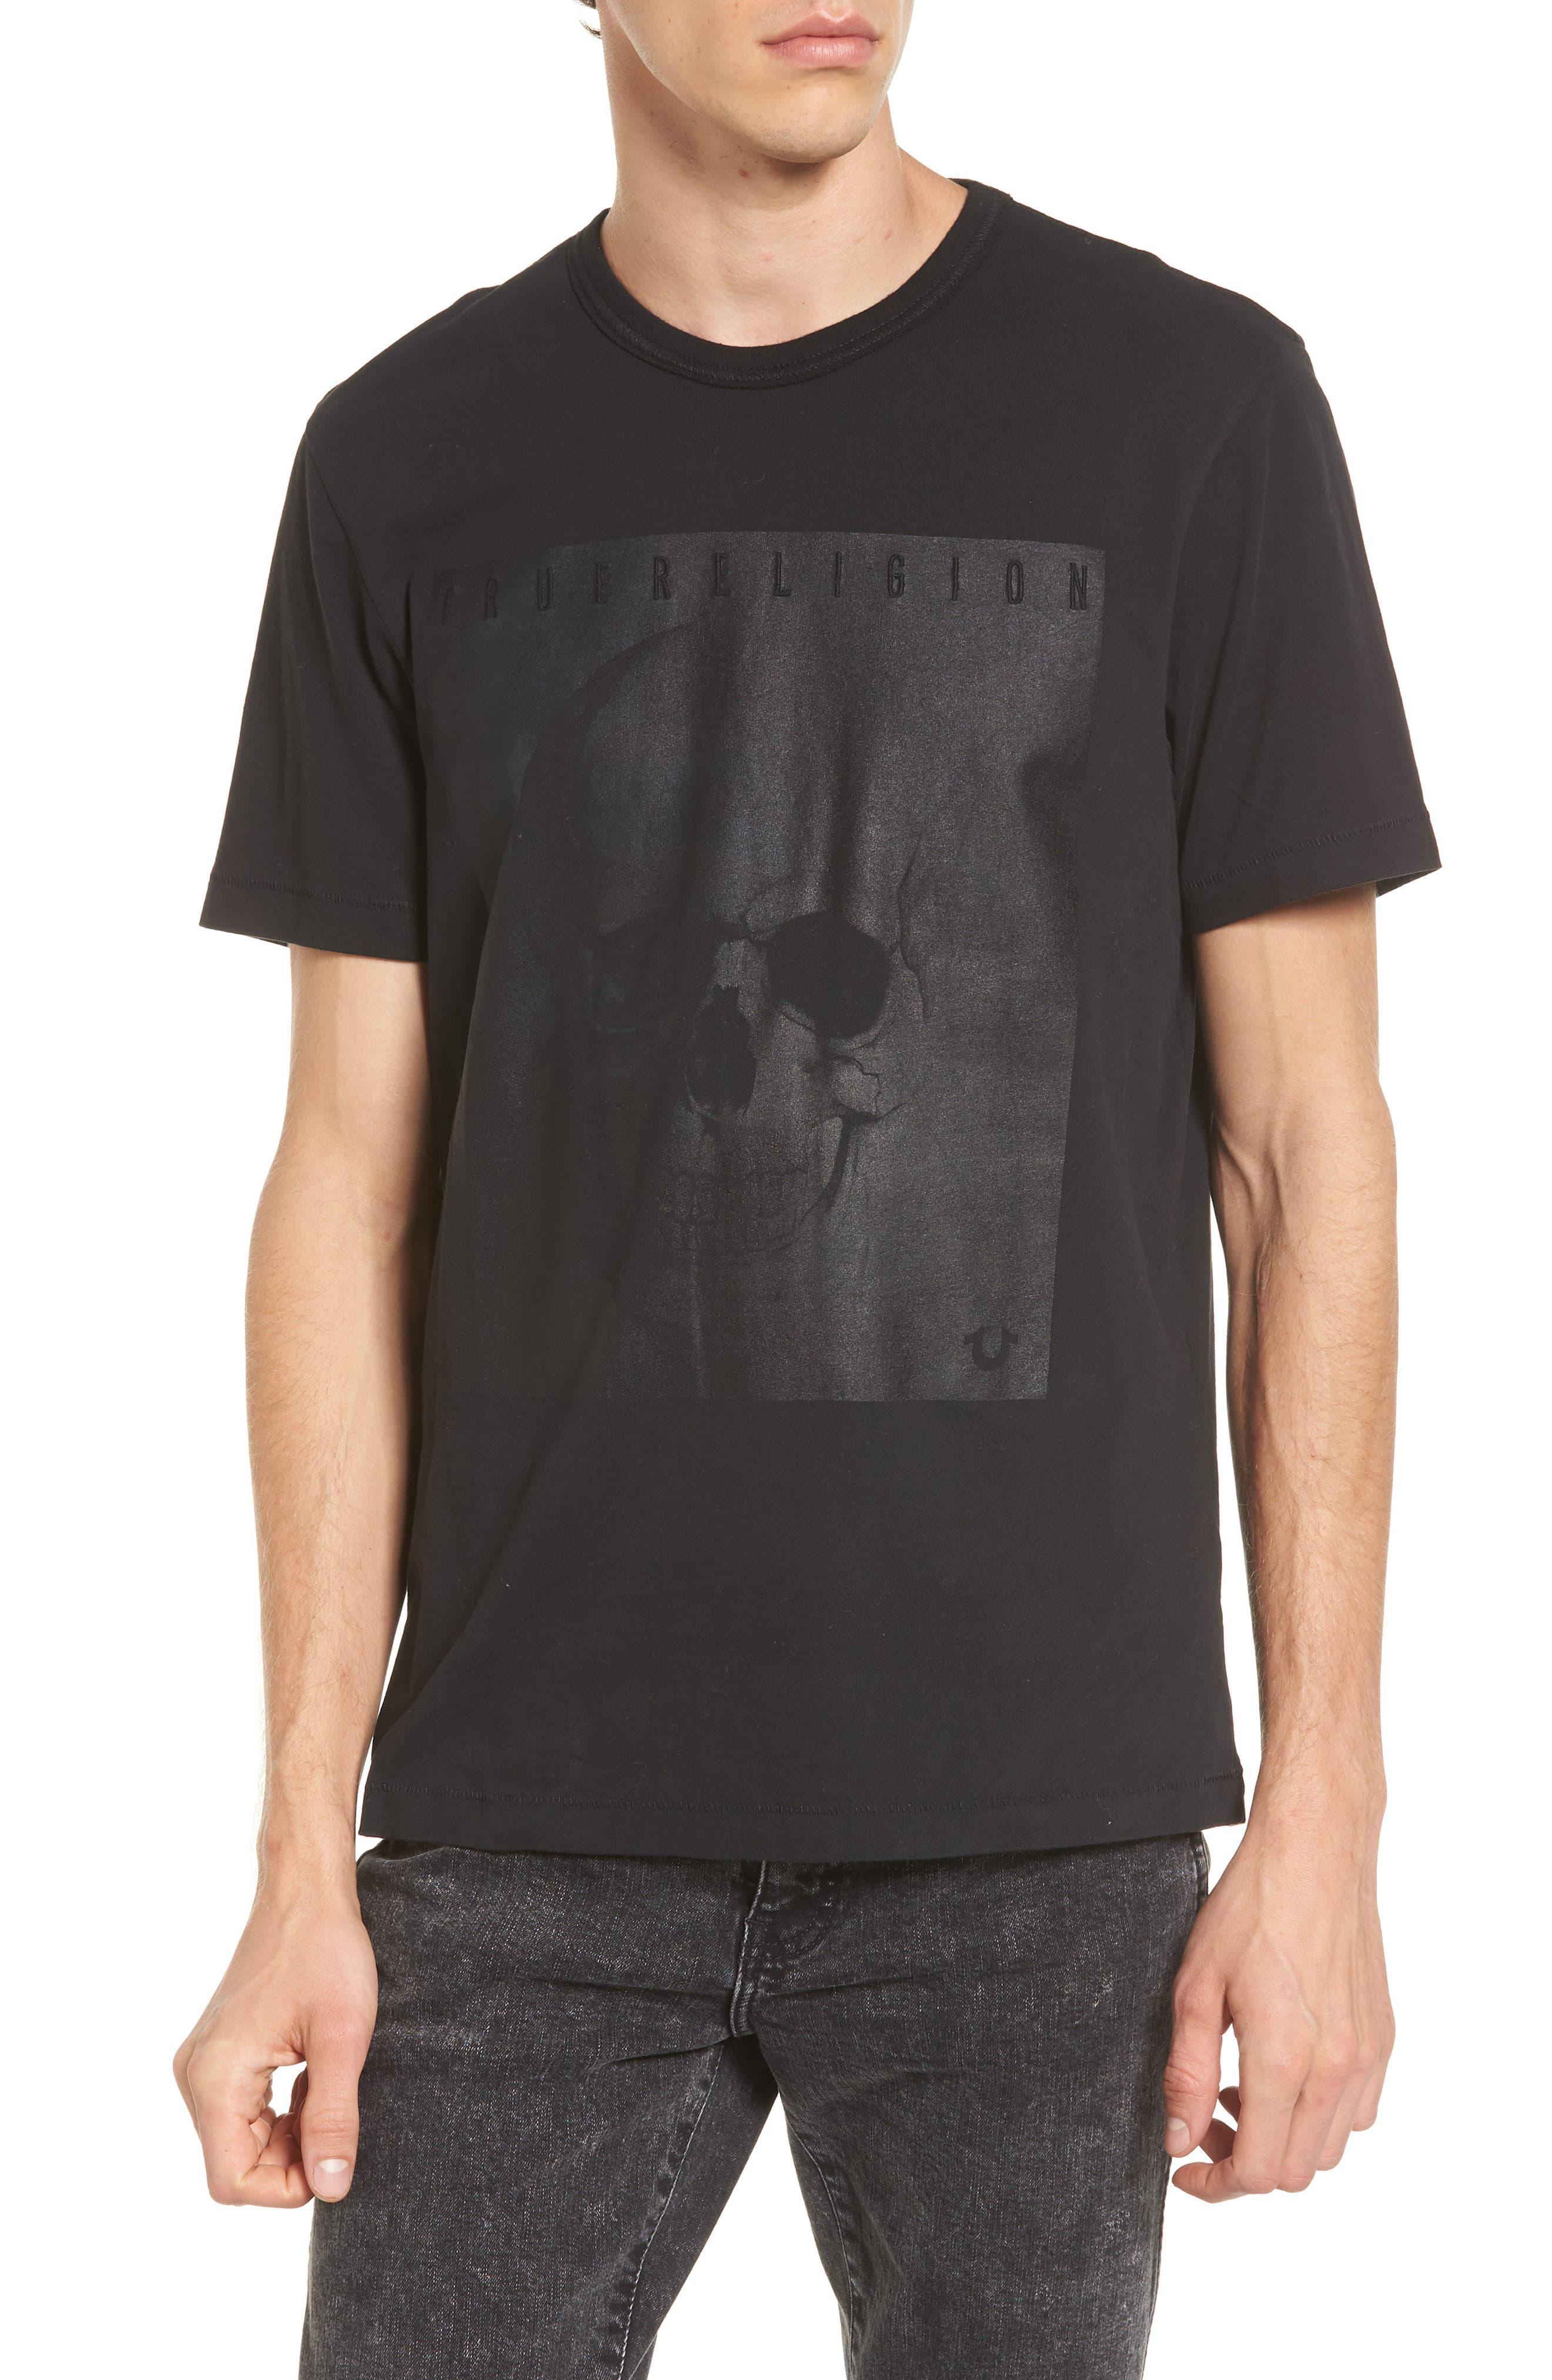 True Religion Brand Jeans Foil Print T-Shirt